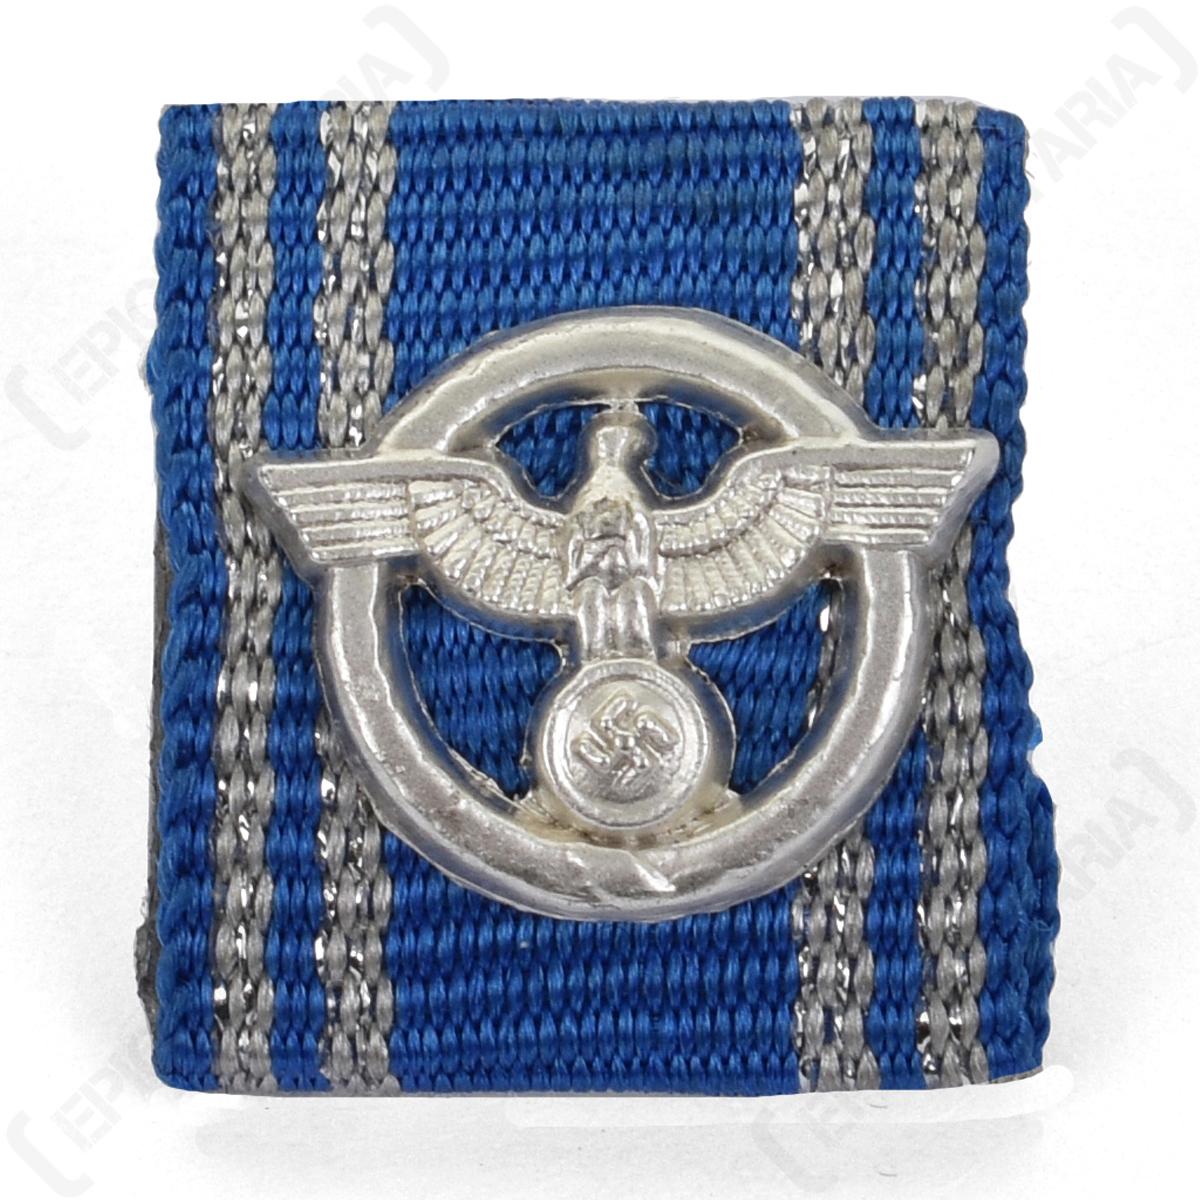 Medal Ribbon Bars